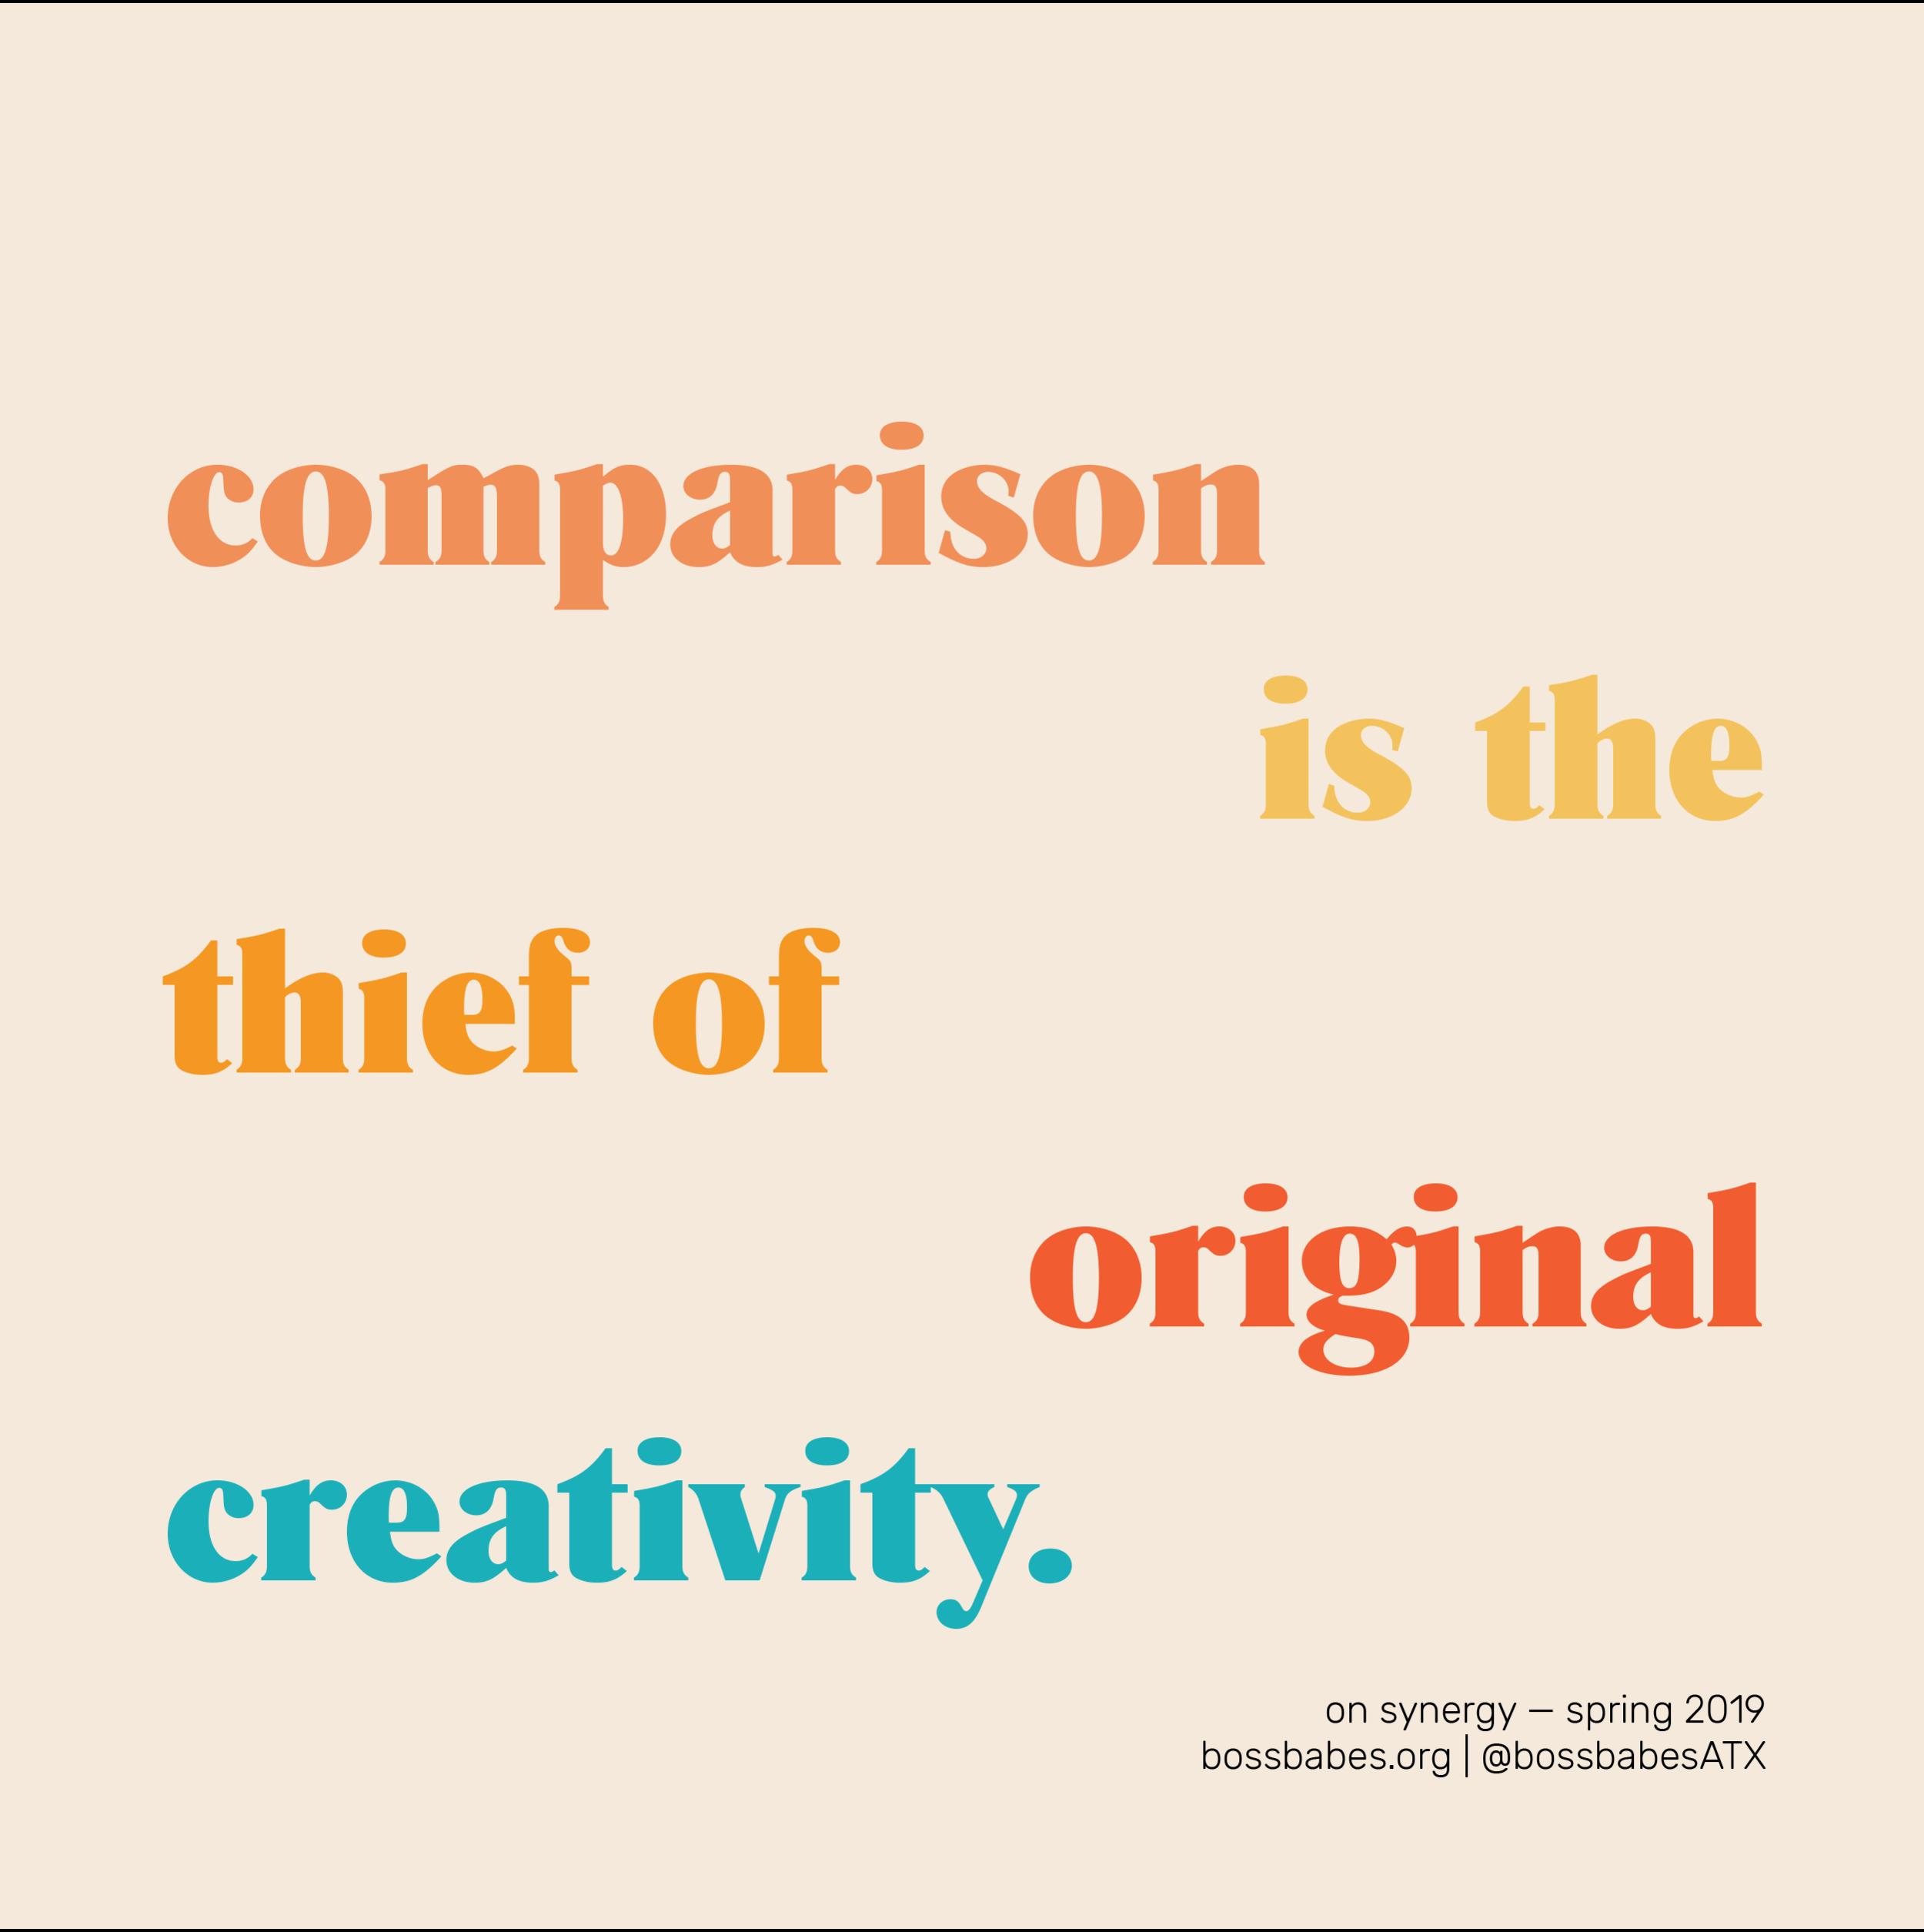 Image designed by Jane Hervey